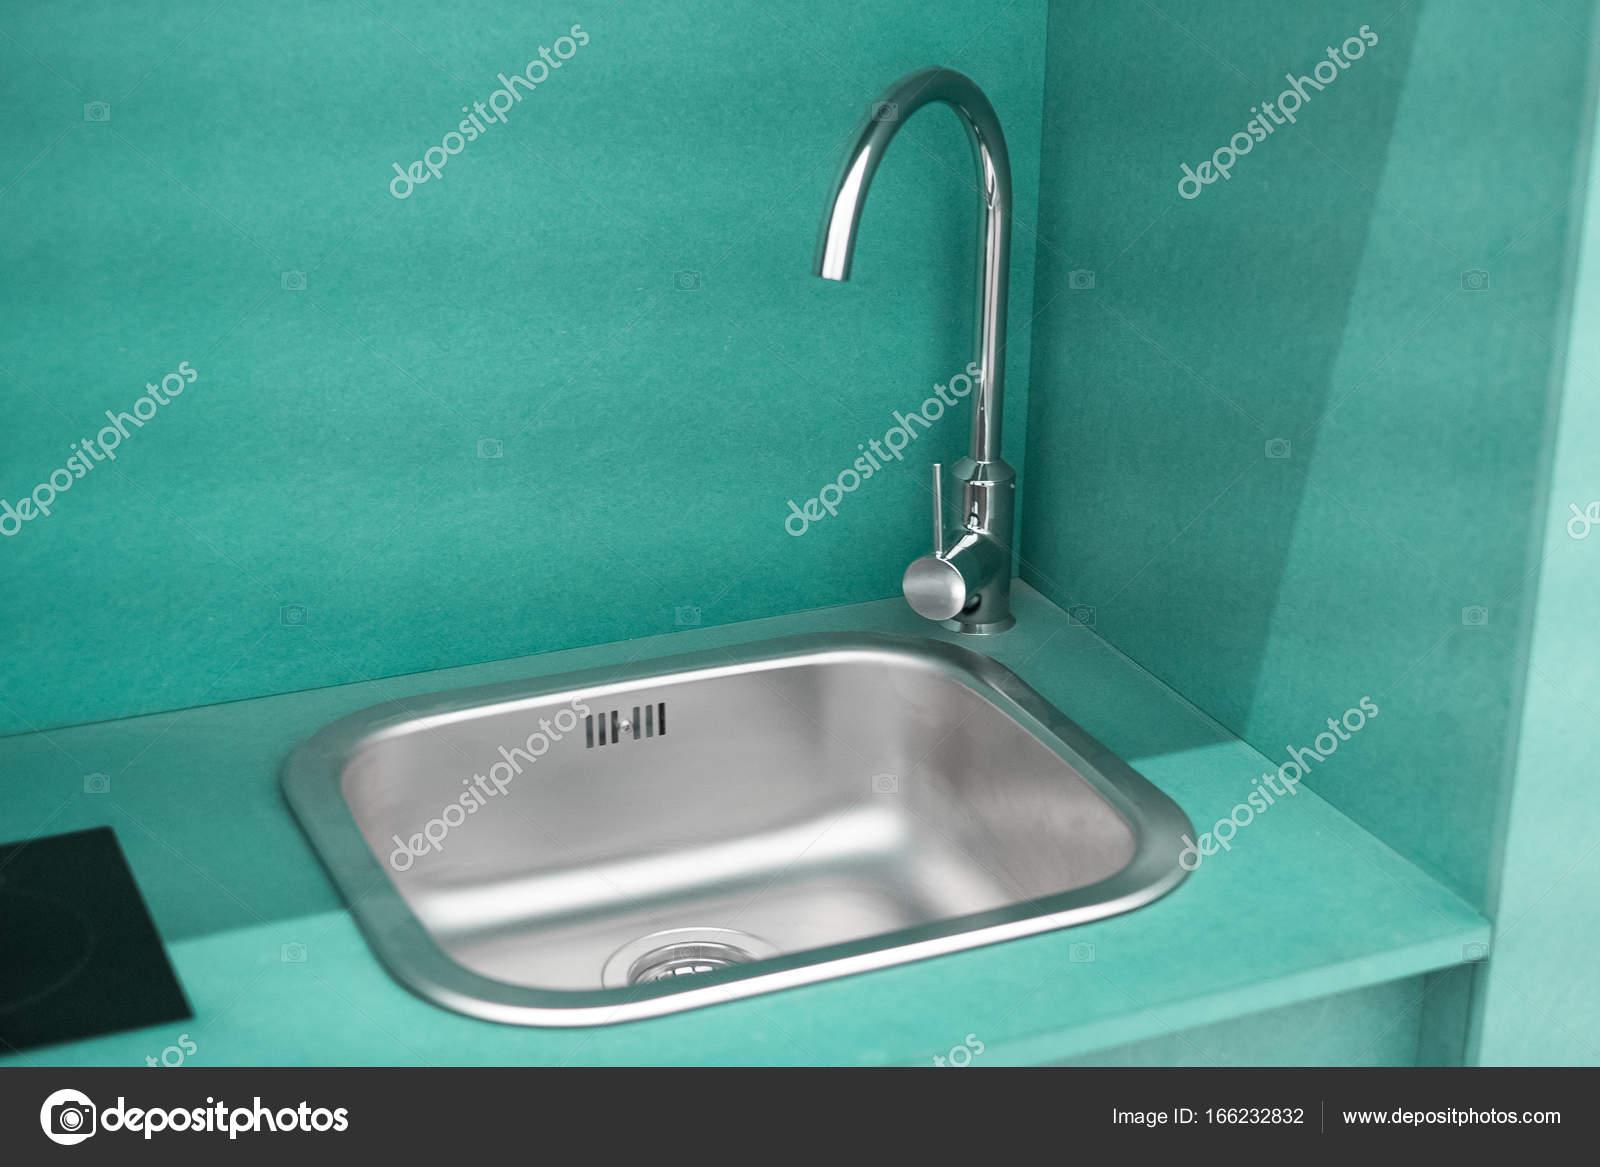 small kitchen sinks aid dish washer 小厨房的水槽 图库照片 c marvlc 166232832